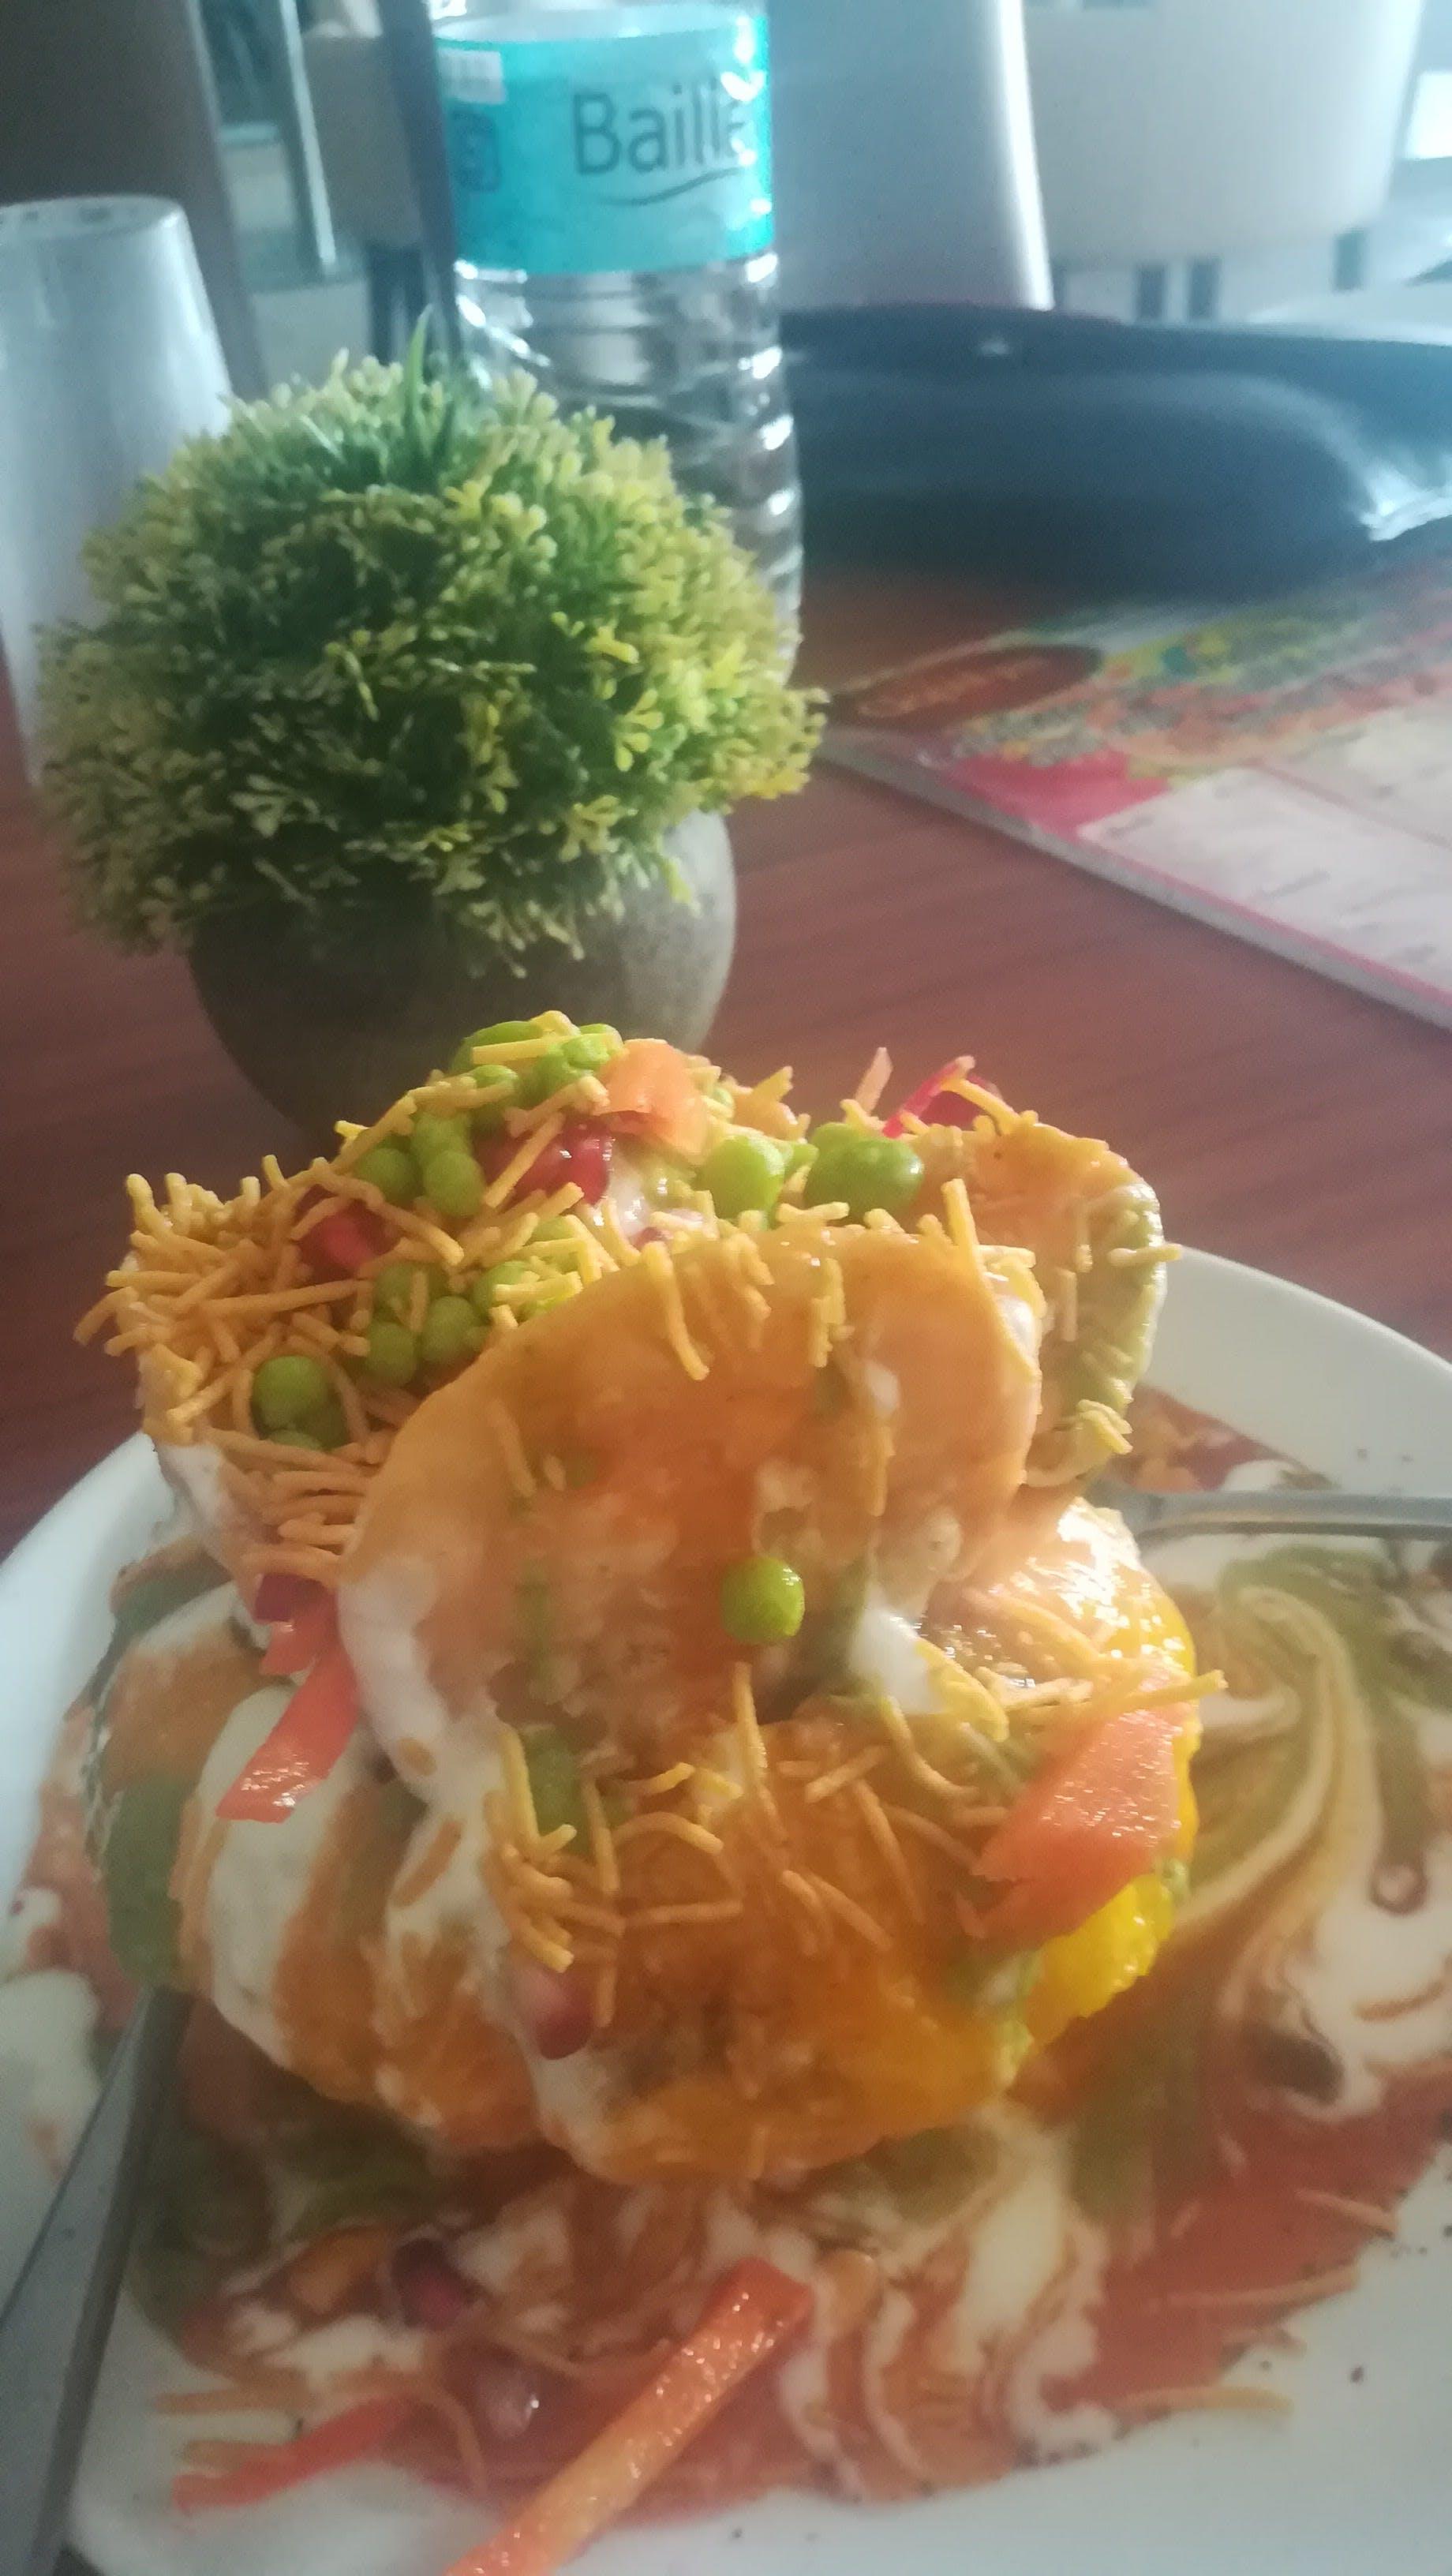 Free stock photo of asian food, fastfood, food plating